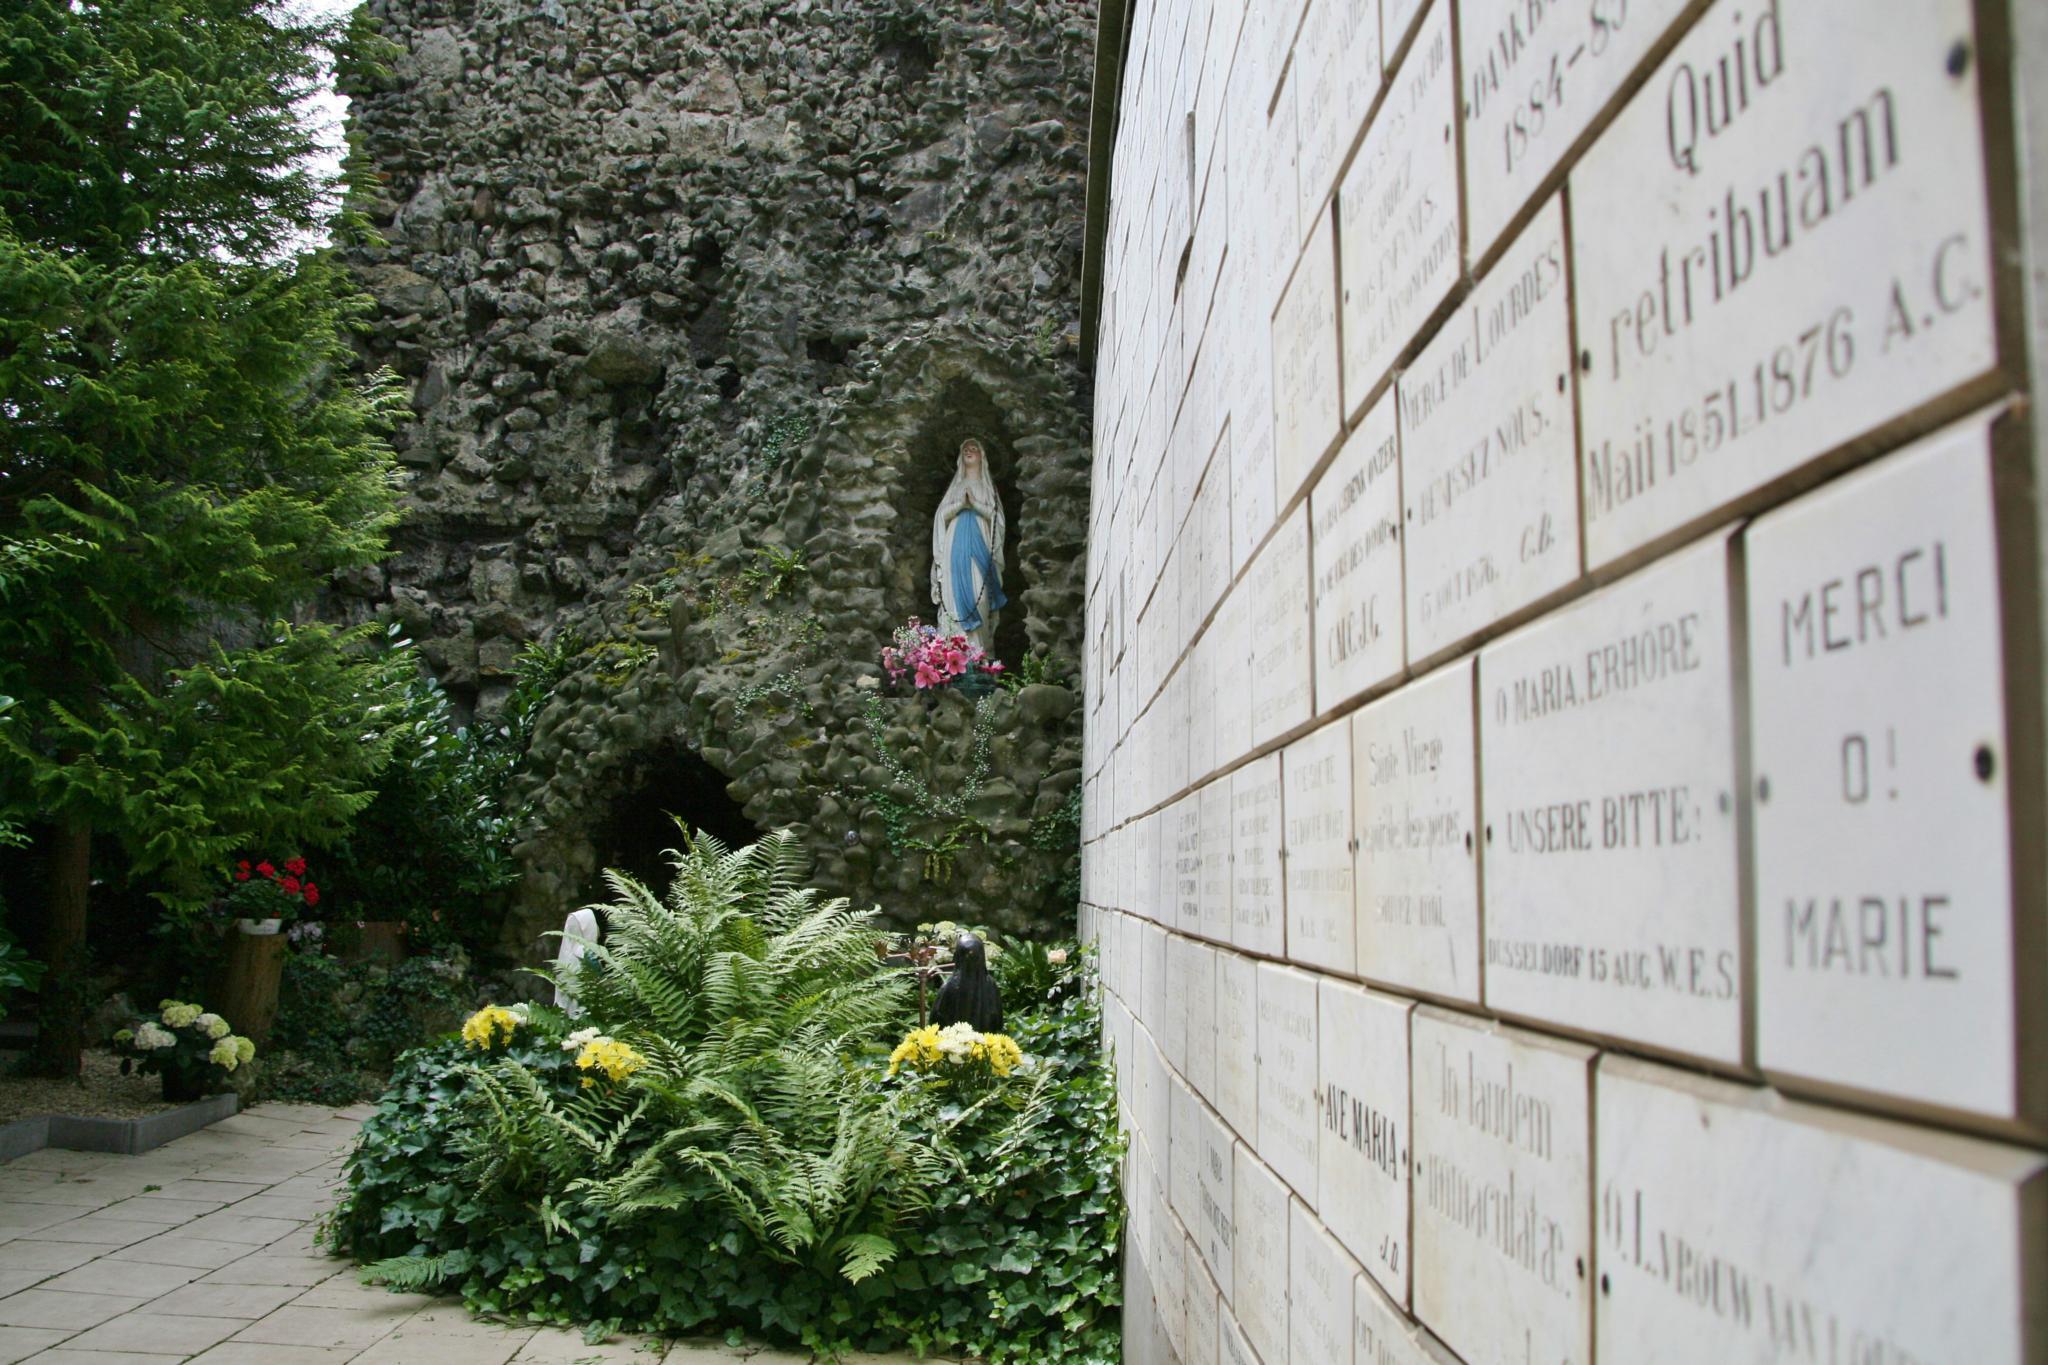 Little chapel by helen.vandenbroek.9